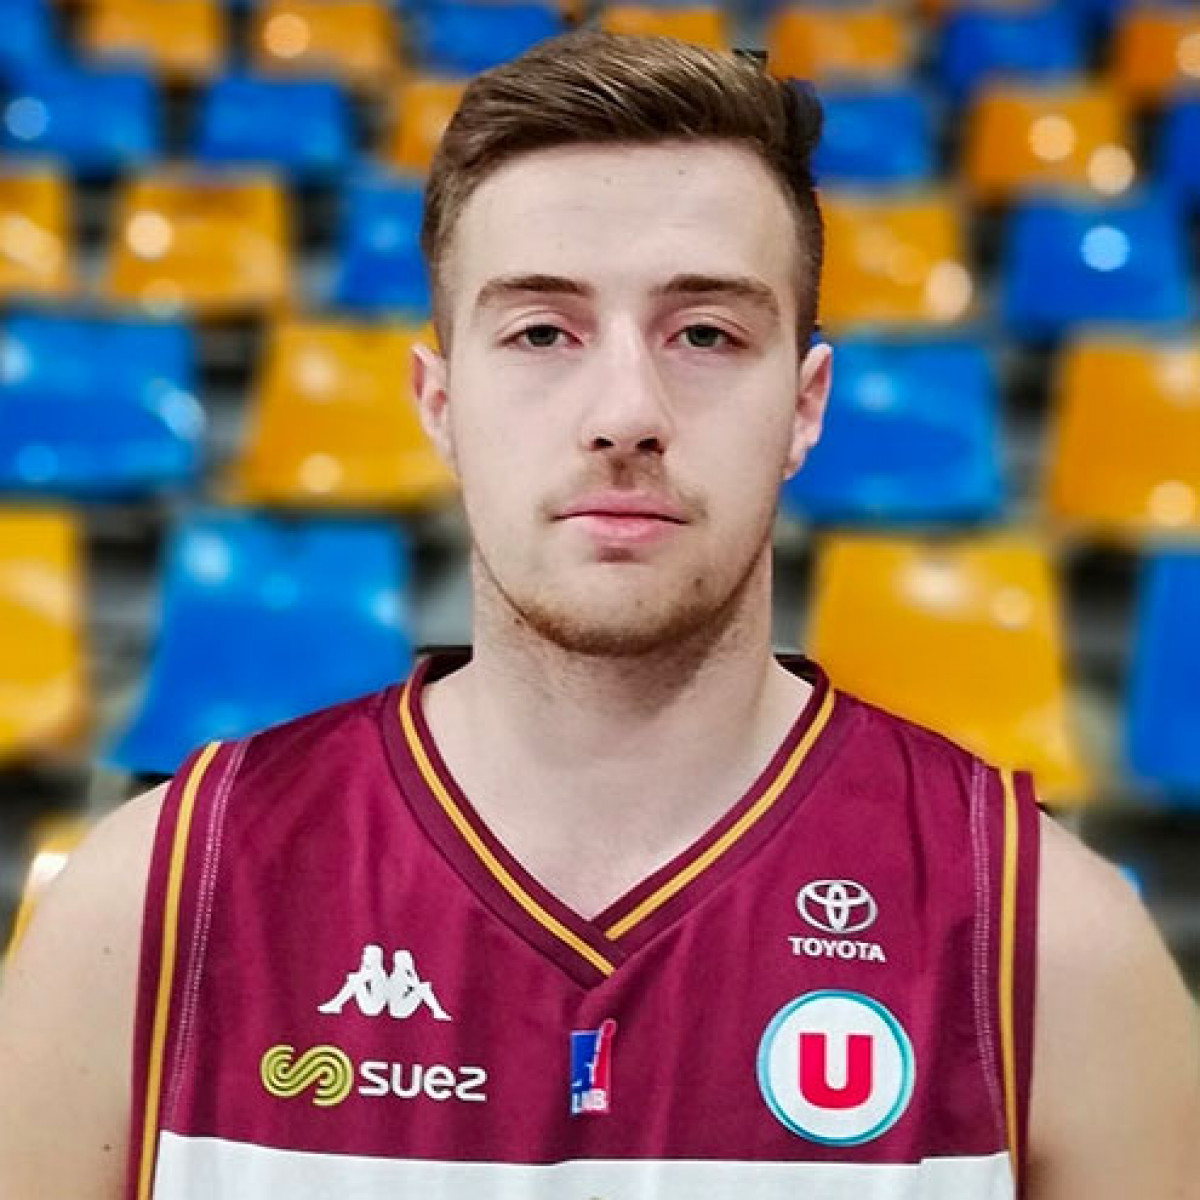 Photo of Clement Dezalle, 2018-2019 season